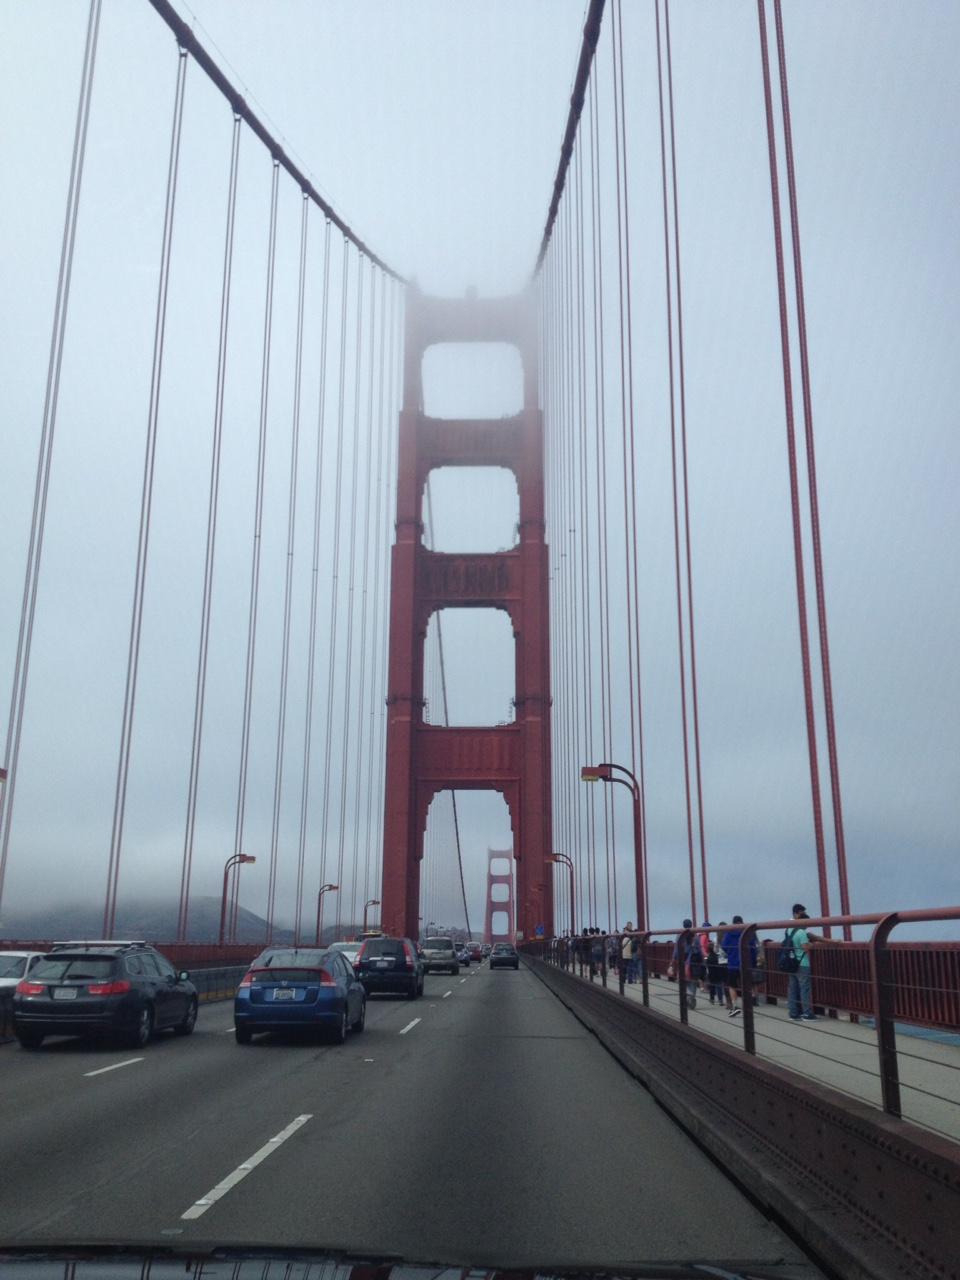 Eternally foggy San Francisco